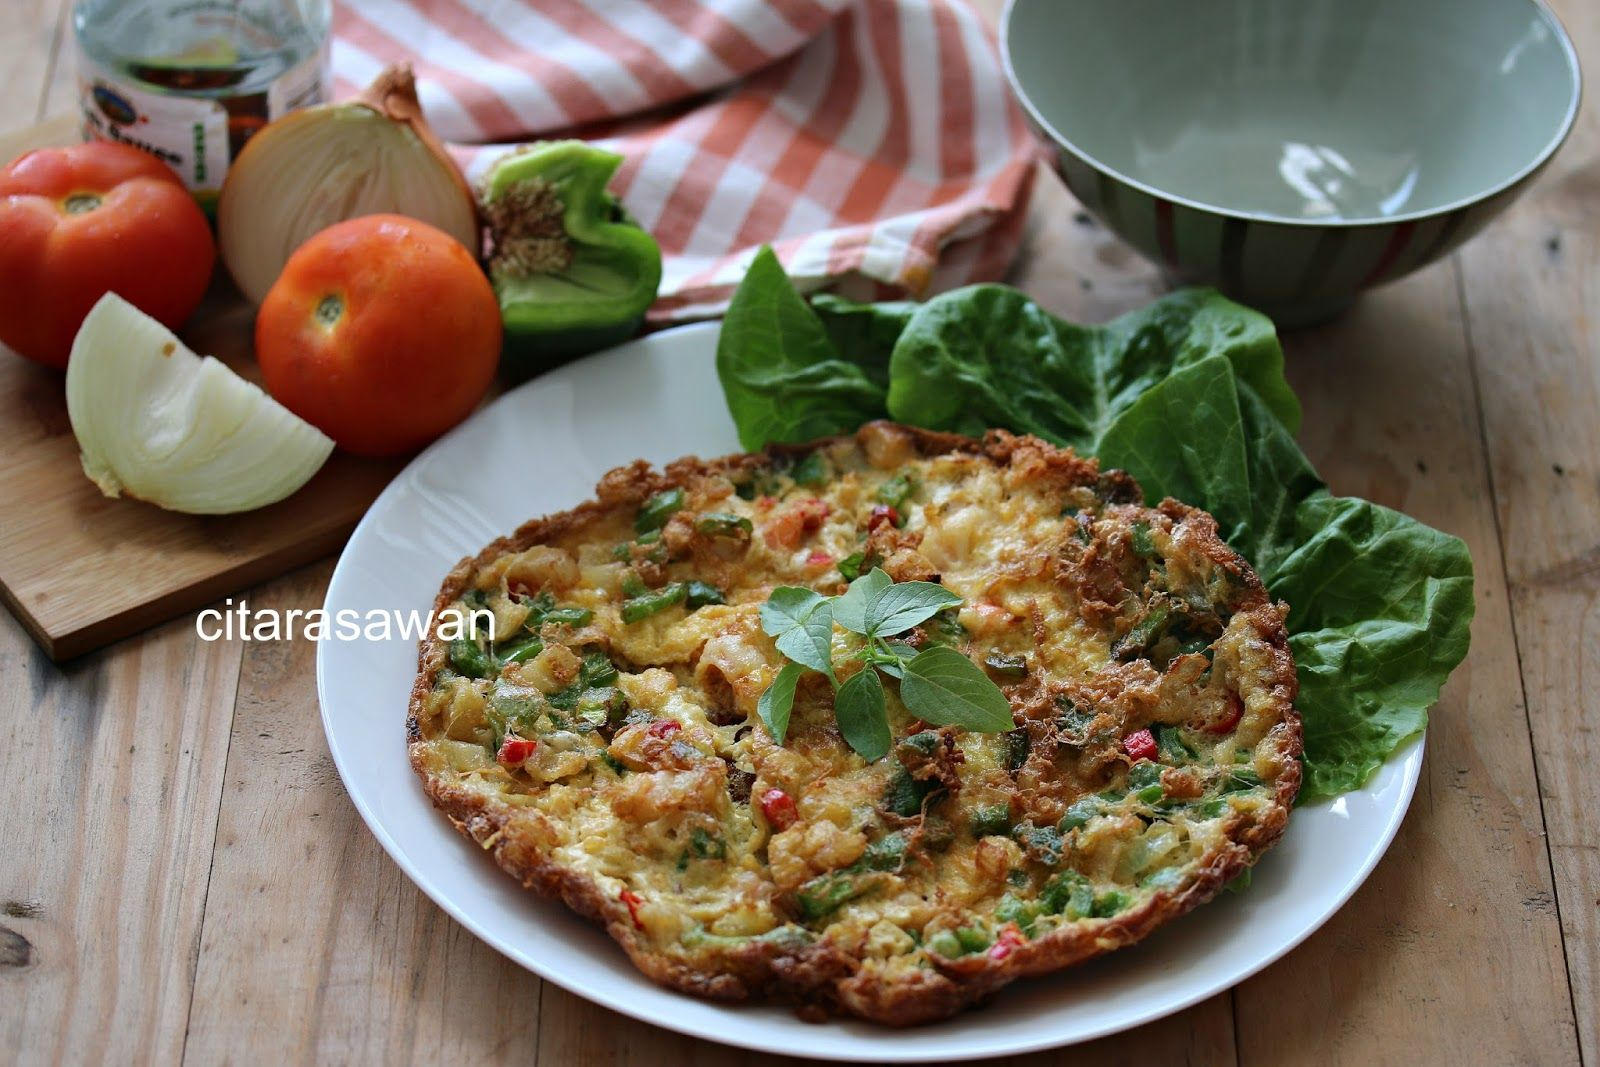 Telur Dadar Thai X2f Thai Omelette Resepi Terbaik Telur Dadar Resep Masakan Asia Makanan